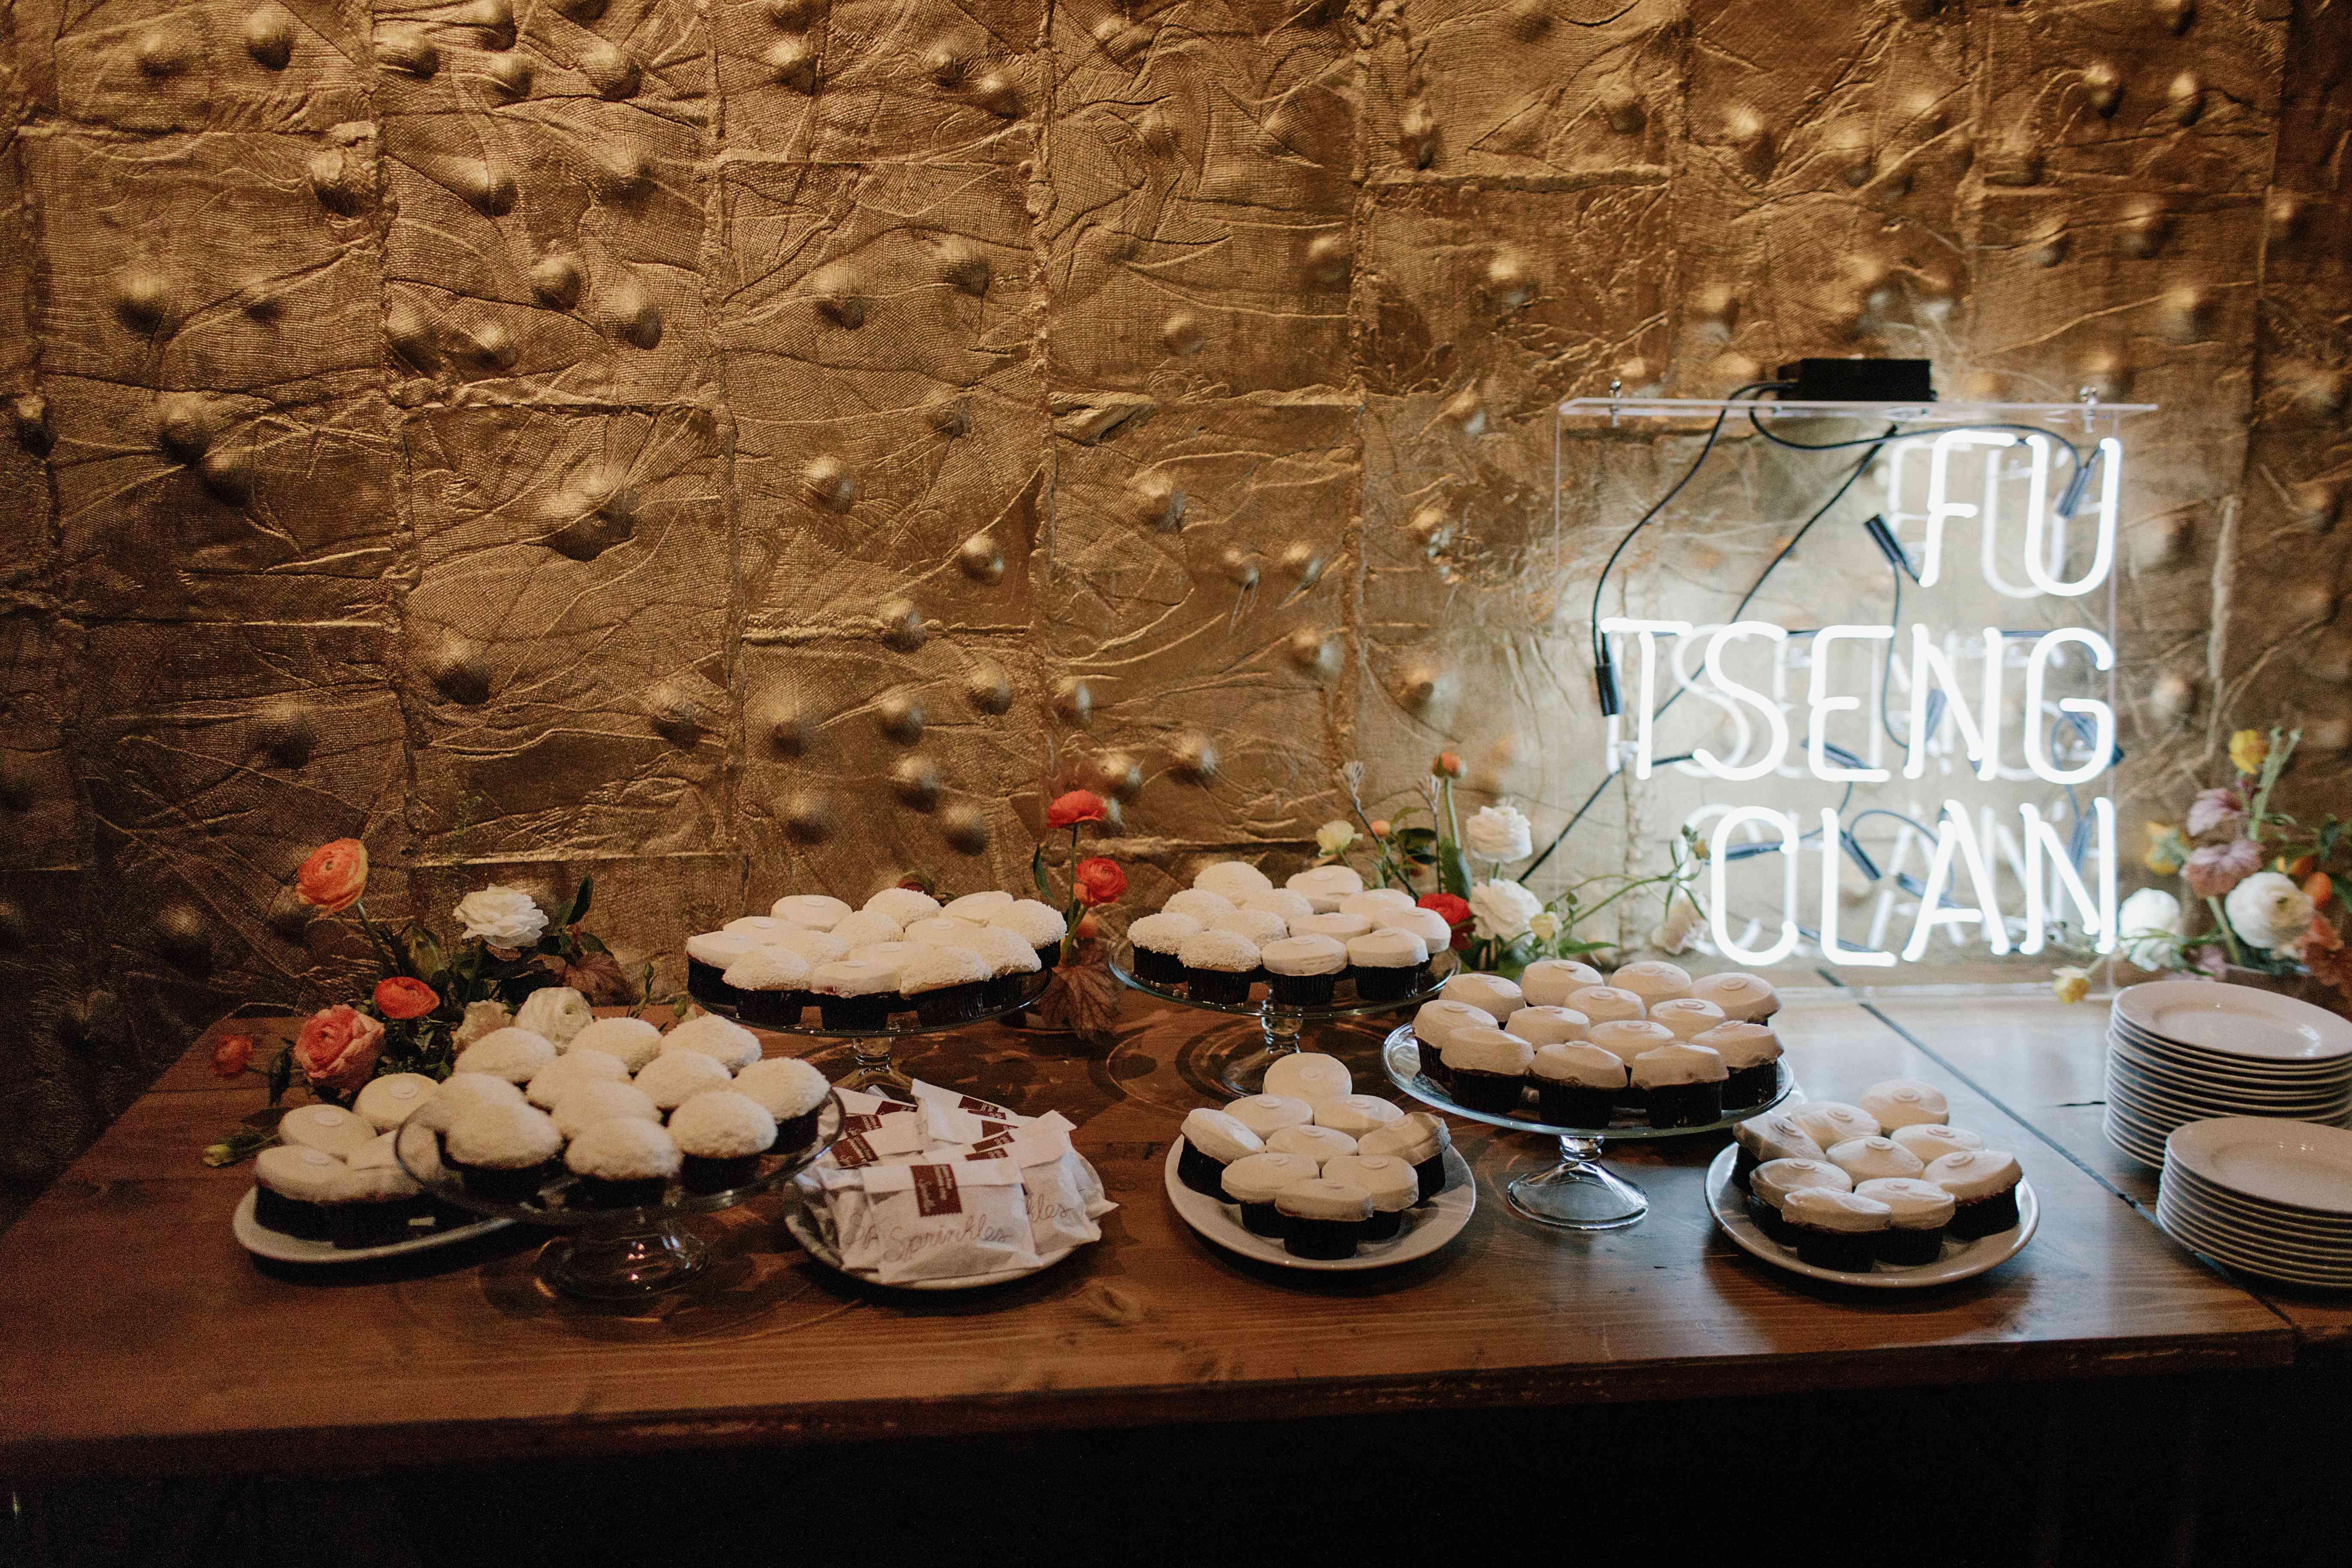 <p>Dessert table</p><br><br>